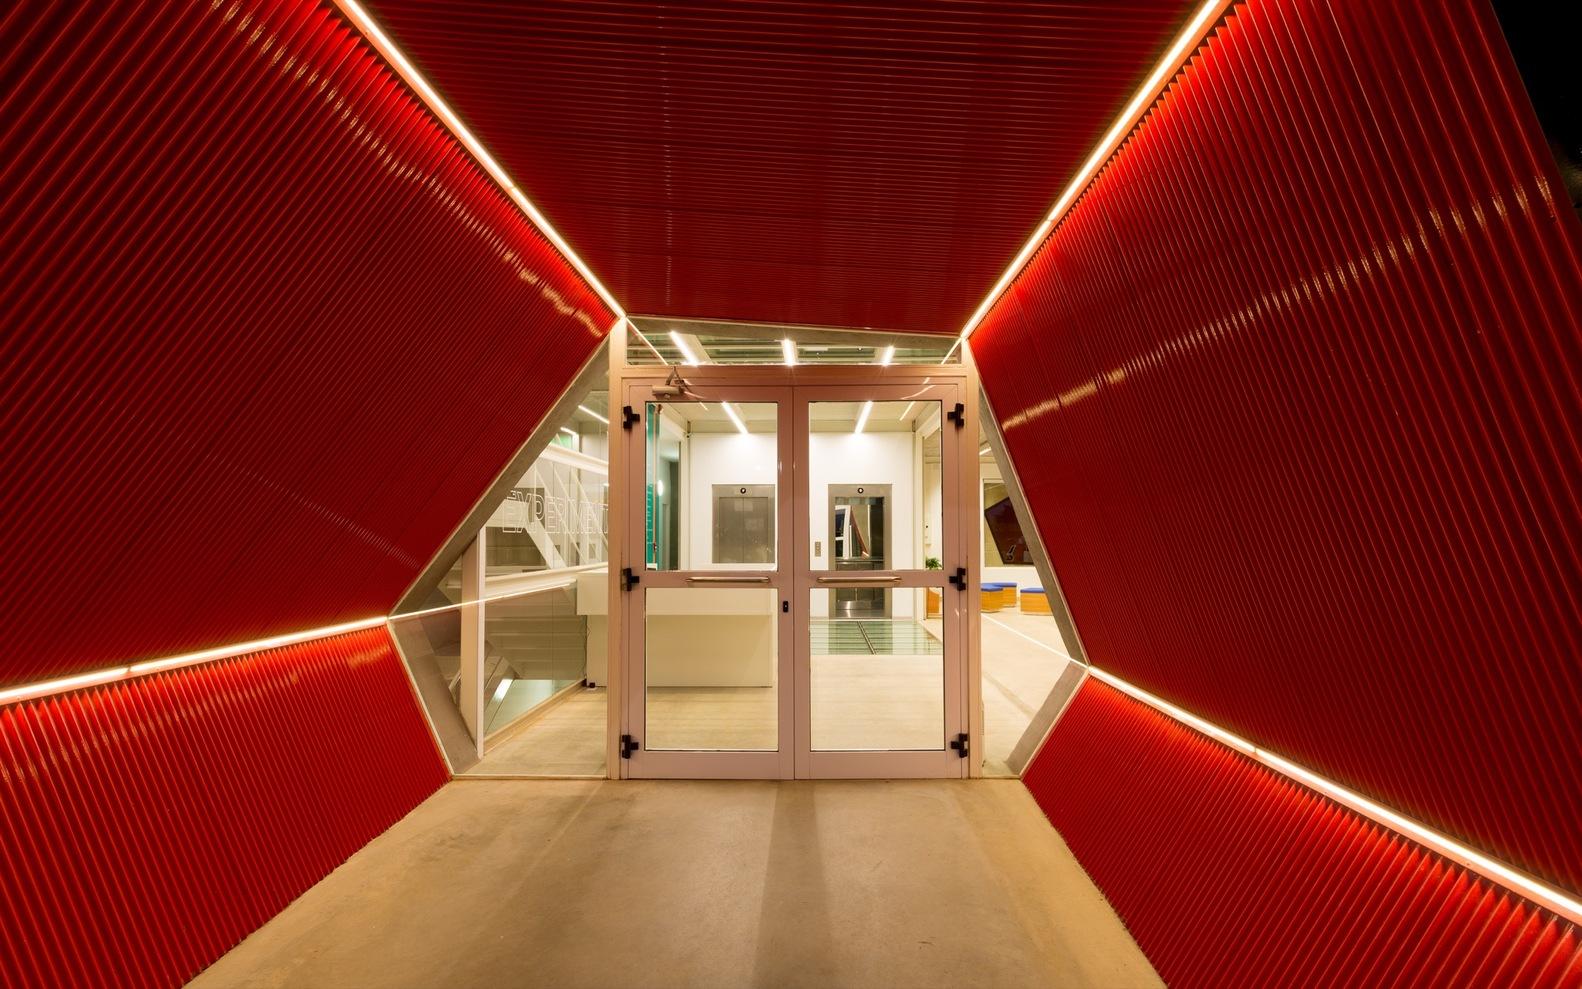 edificio-experimenta-21-mgm-arquitectos-gonzalo-viramonte-05